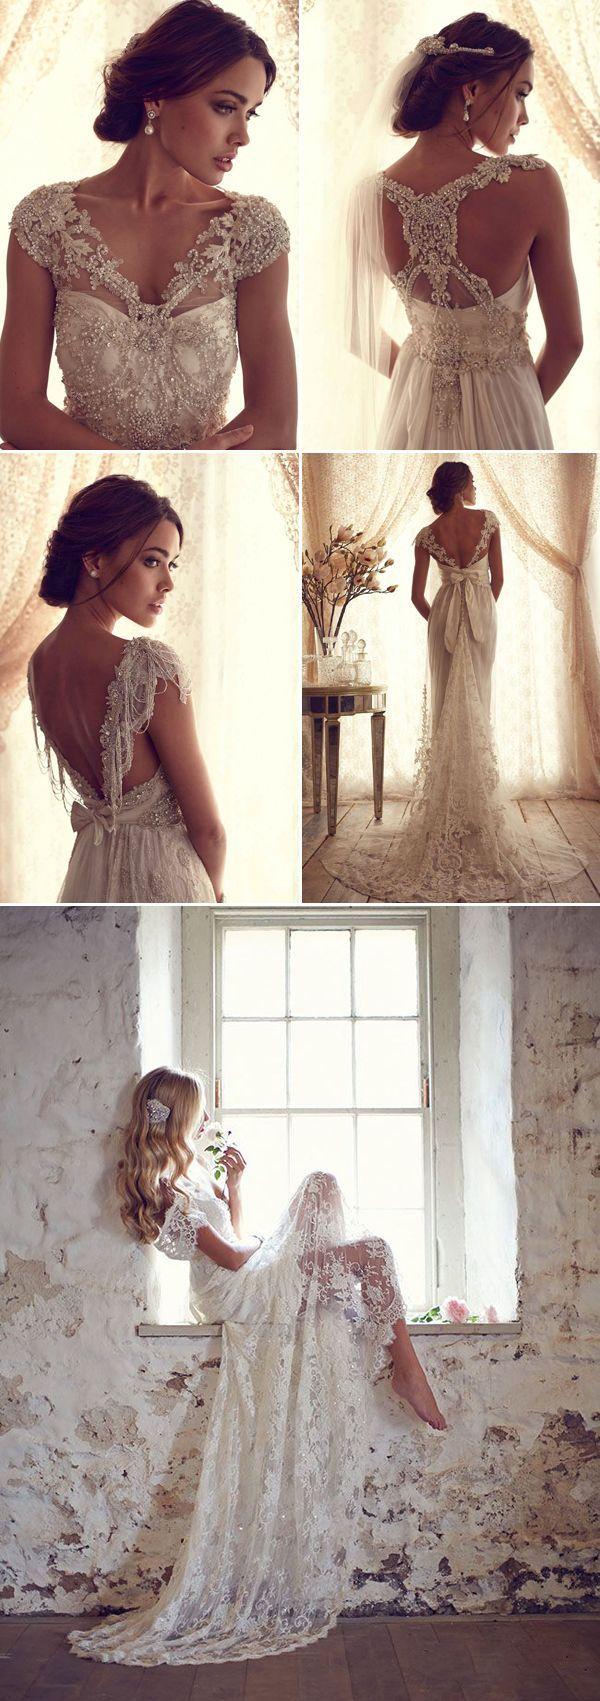 "48 Prettiest Vintage Wedding Dresses You Will Love!-**EXPLORE an Amazing Collection of ""Theme Matching Wedding Invitation Sets"" GO TO ... http://www.zazzle.com/weddinginvitationkit"